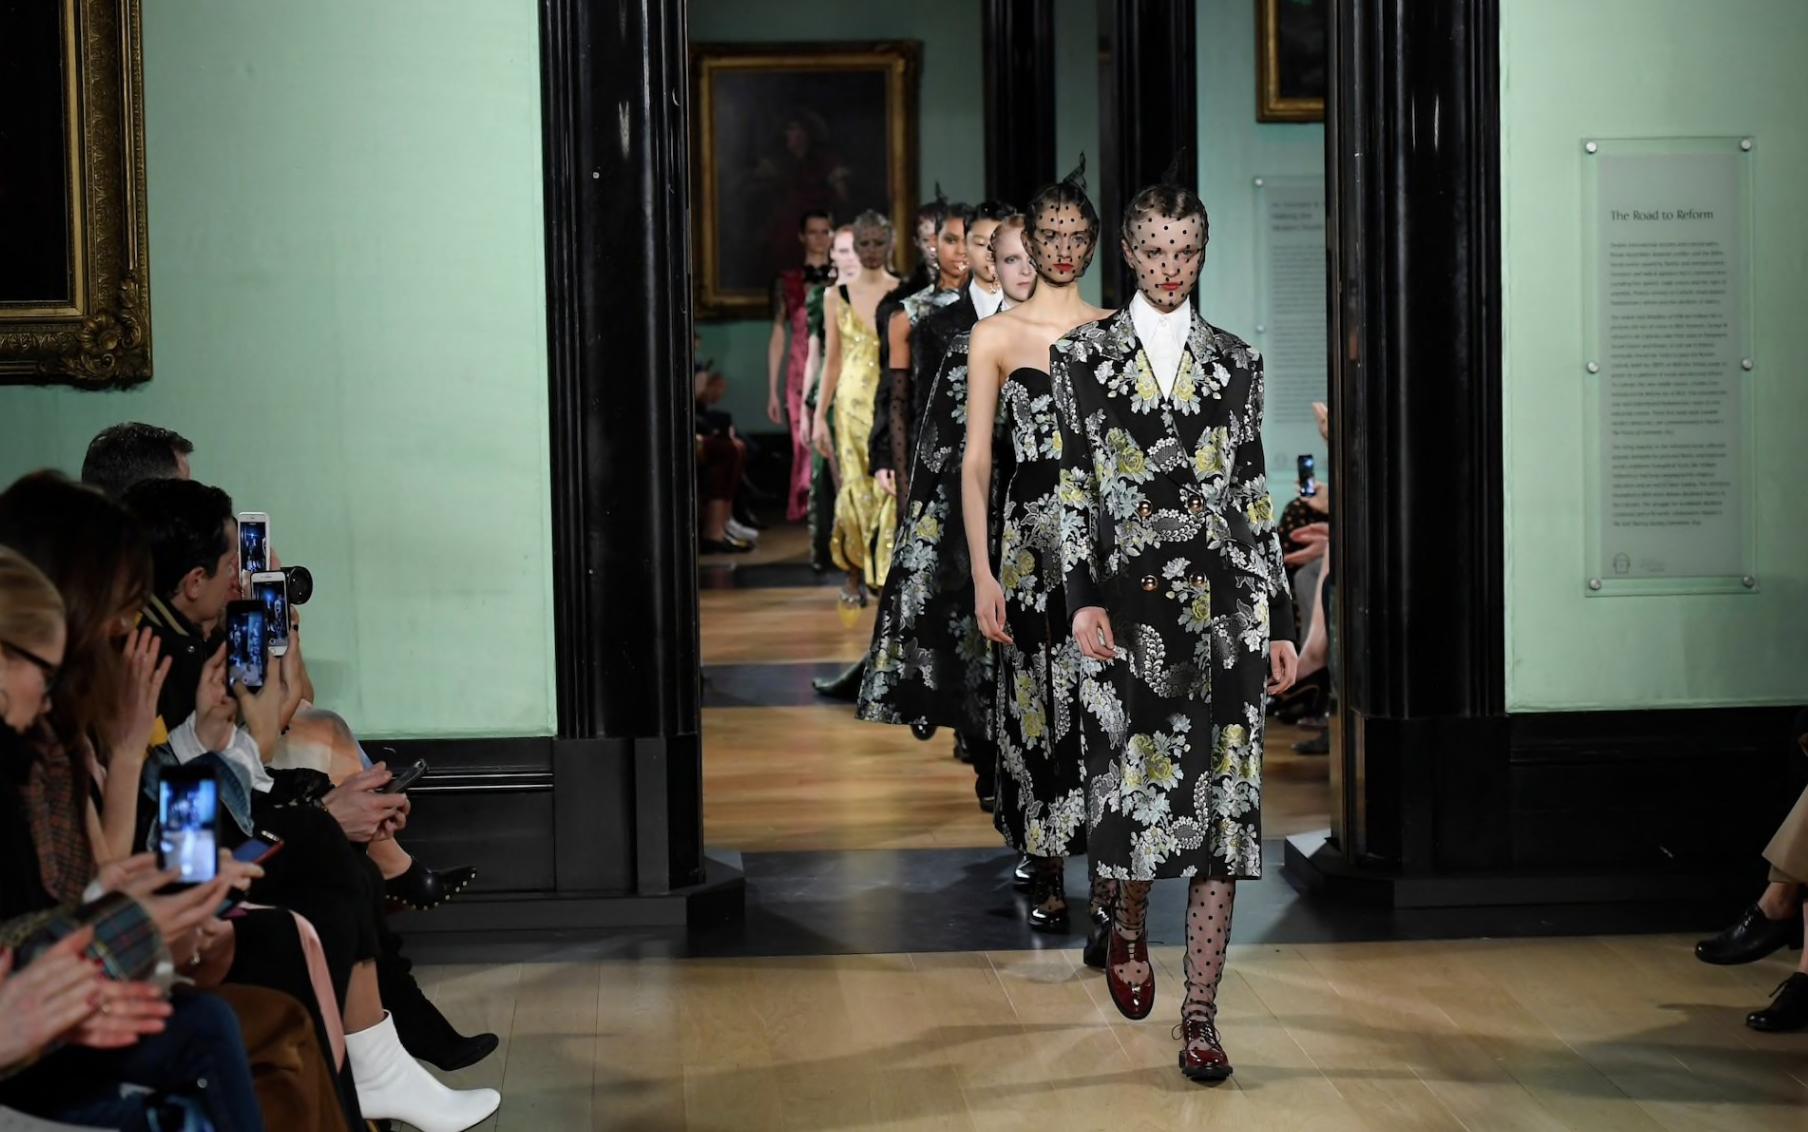 The London Fashion Week Erdem show at the National Portrait Gallery. CREDIT: WWD/REX/SHUTTERSTOCK